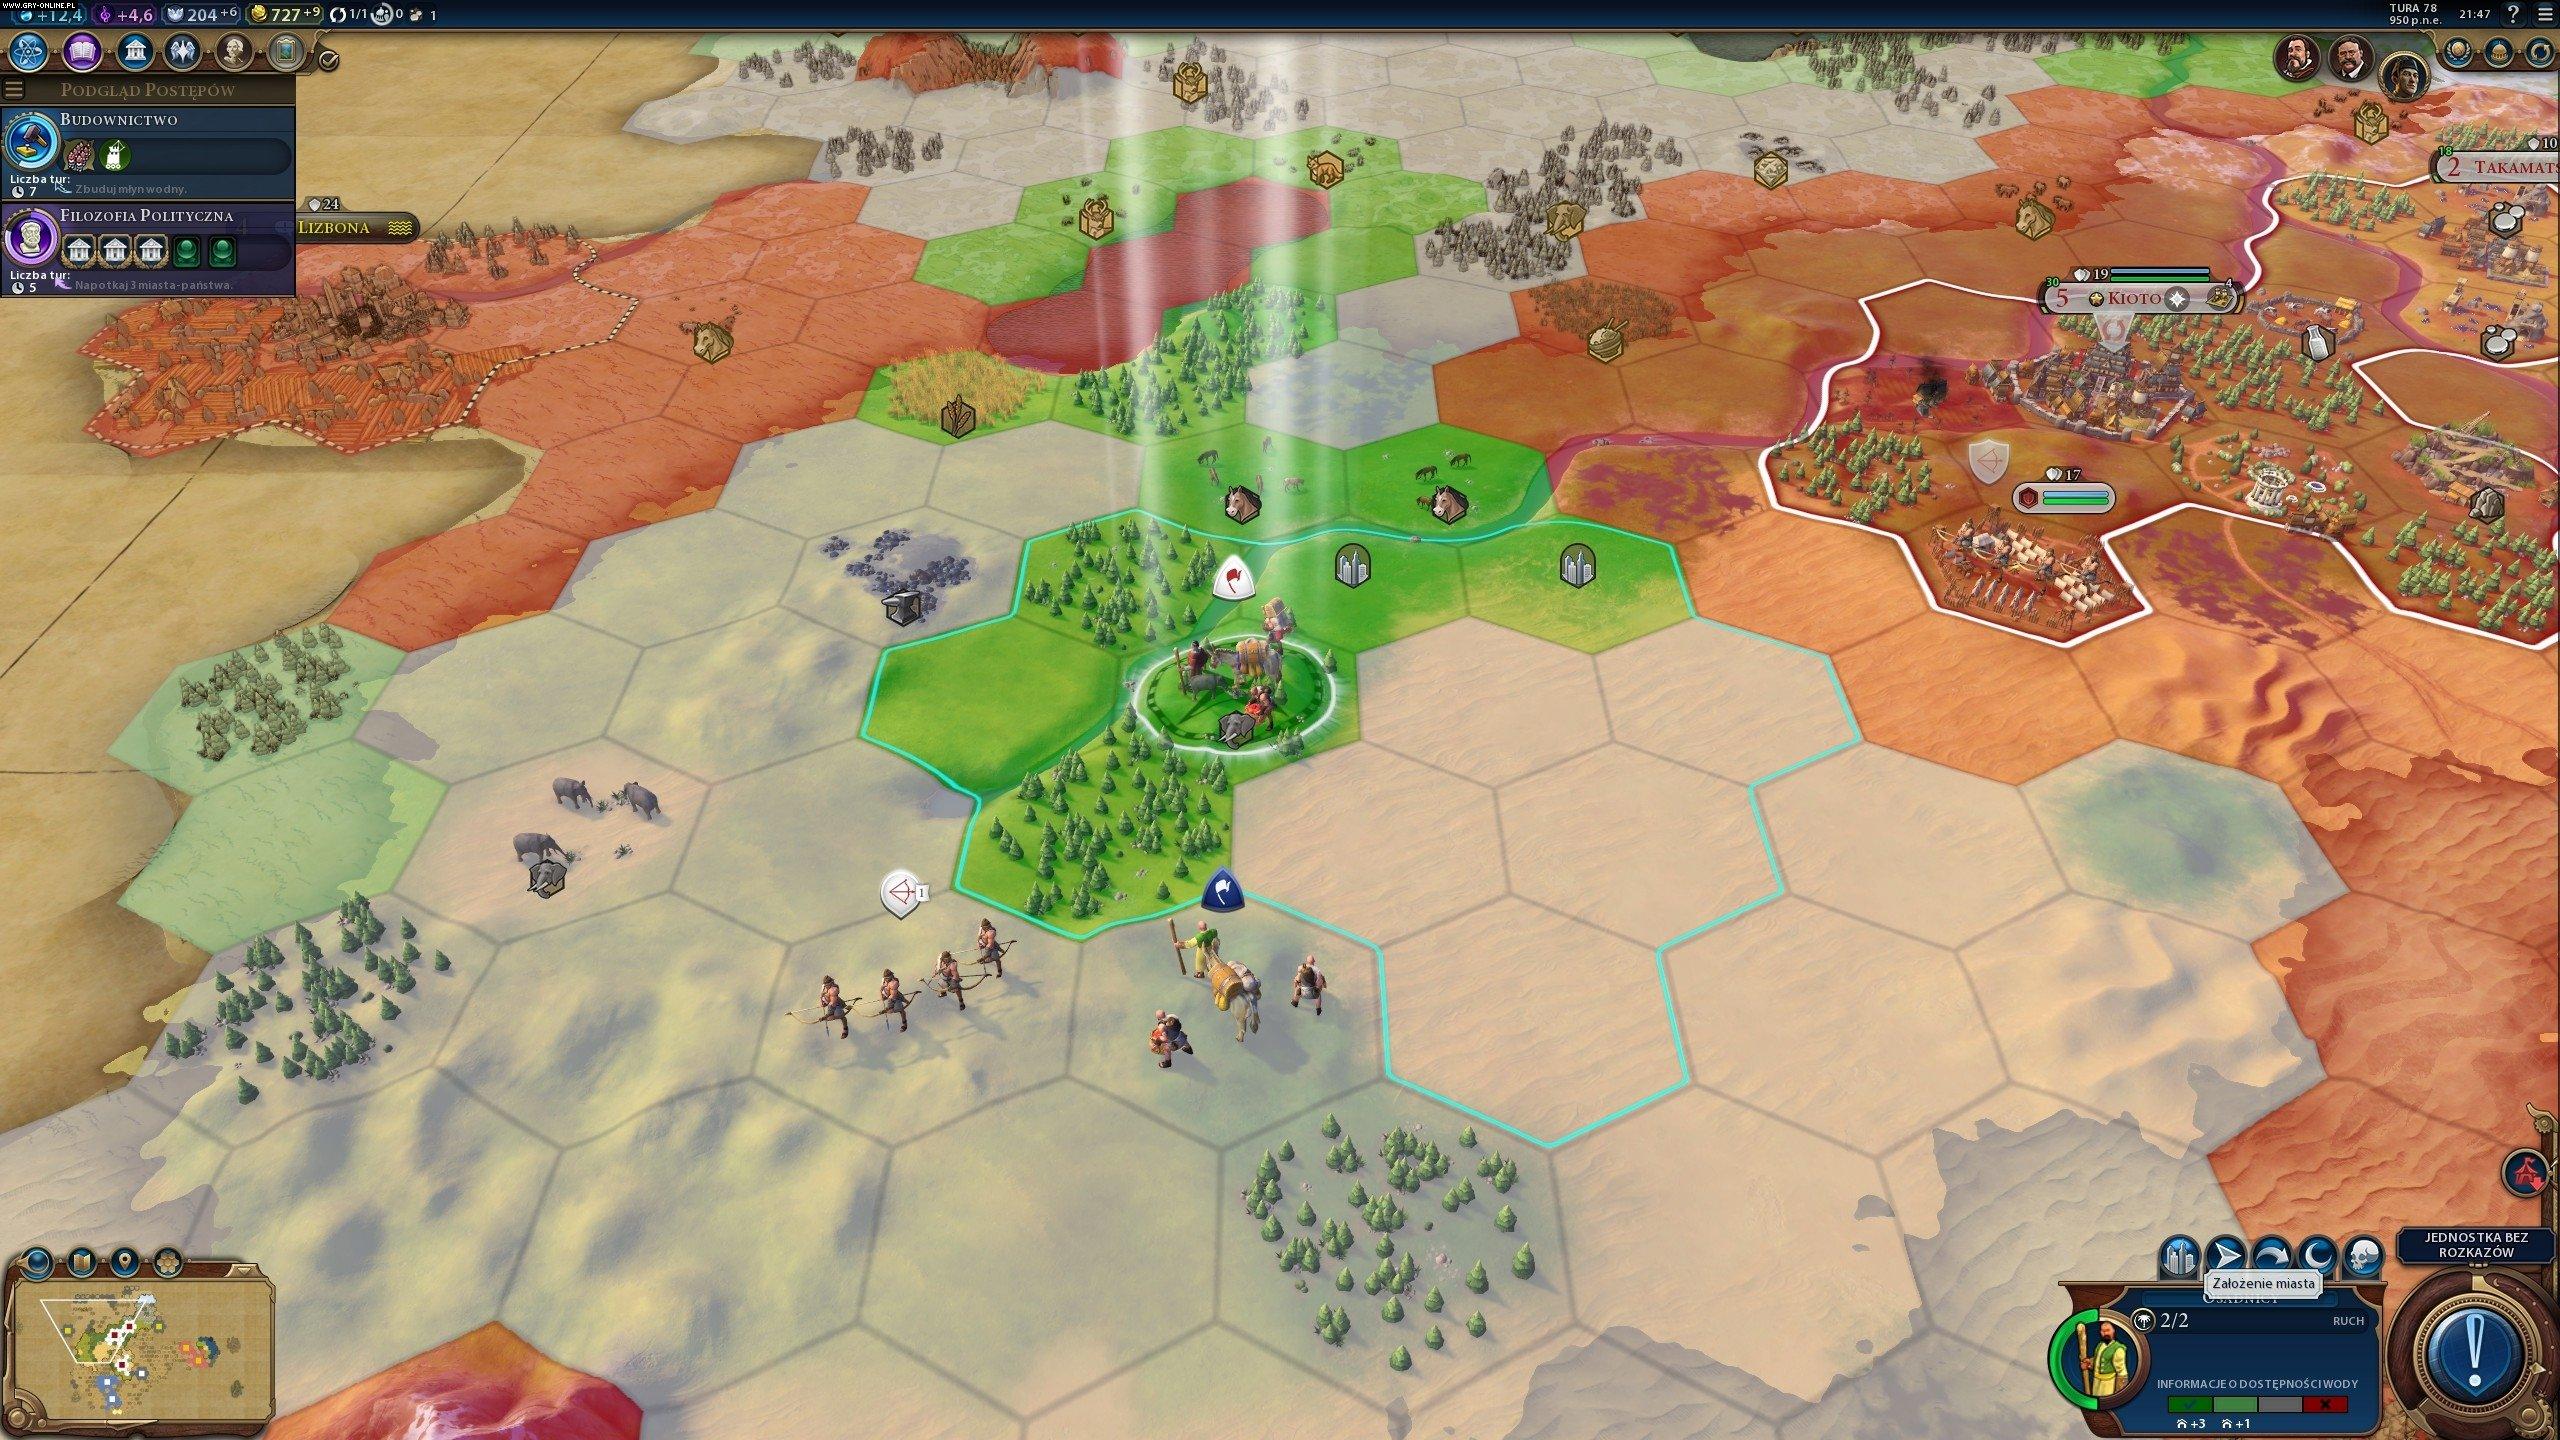 Sid Meier's Civilization VI - screenshots gallery